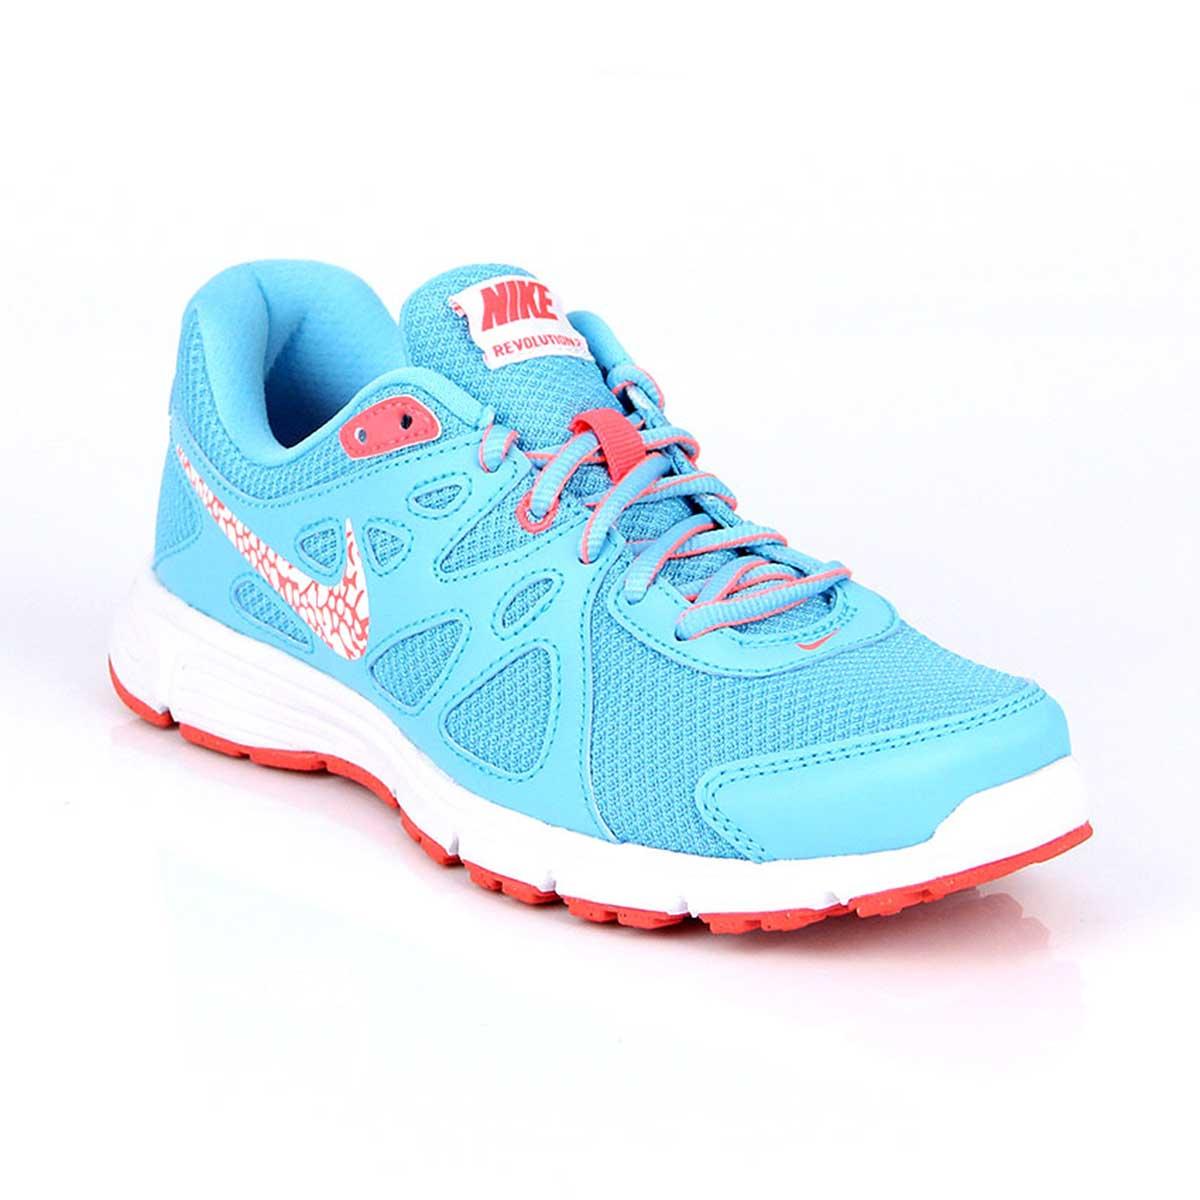 ae9b4a9e Nike Revolution 2 Womens Running Shoes (Blue/White/Pink)